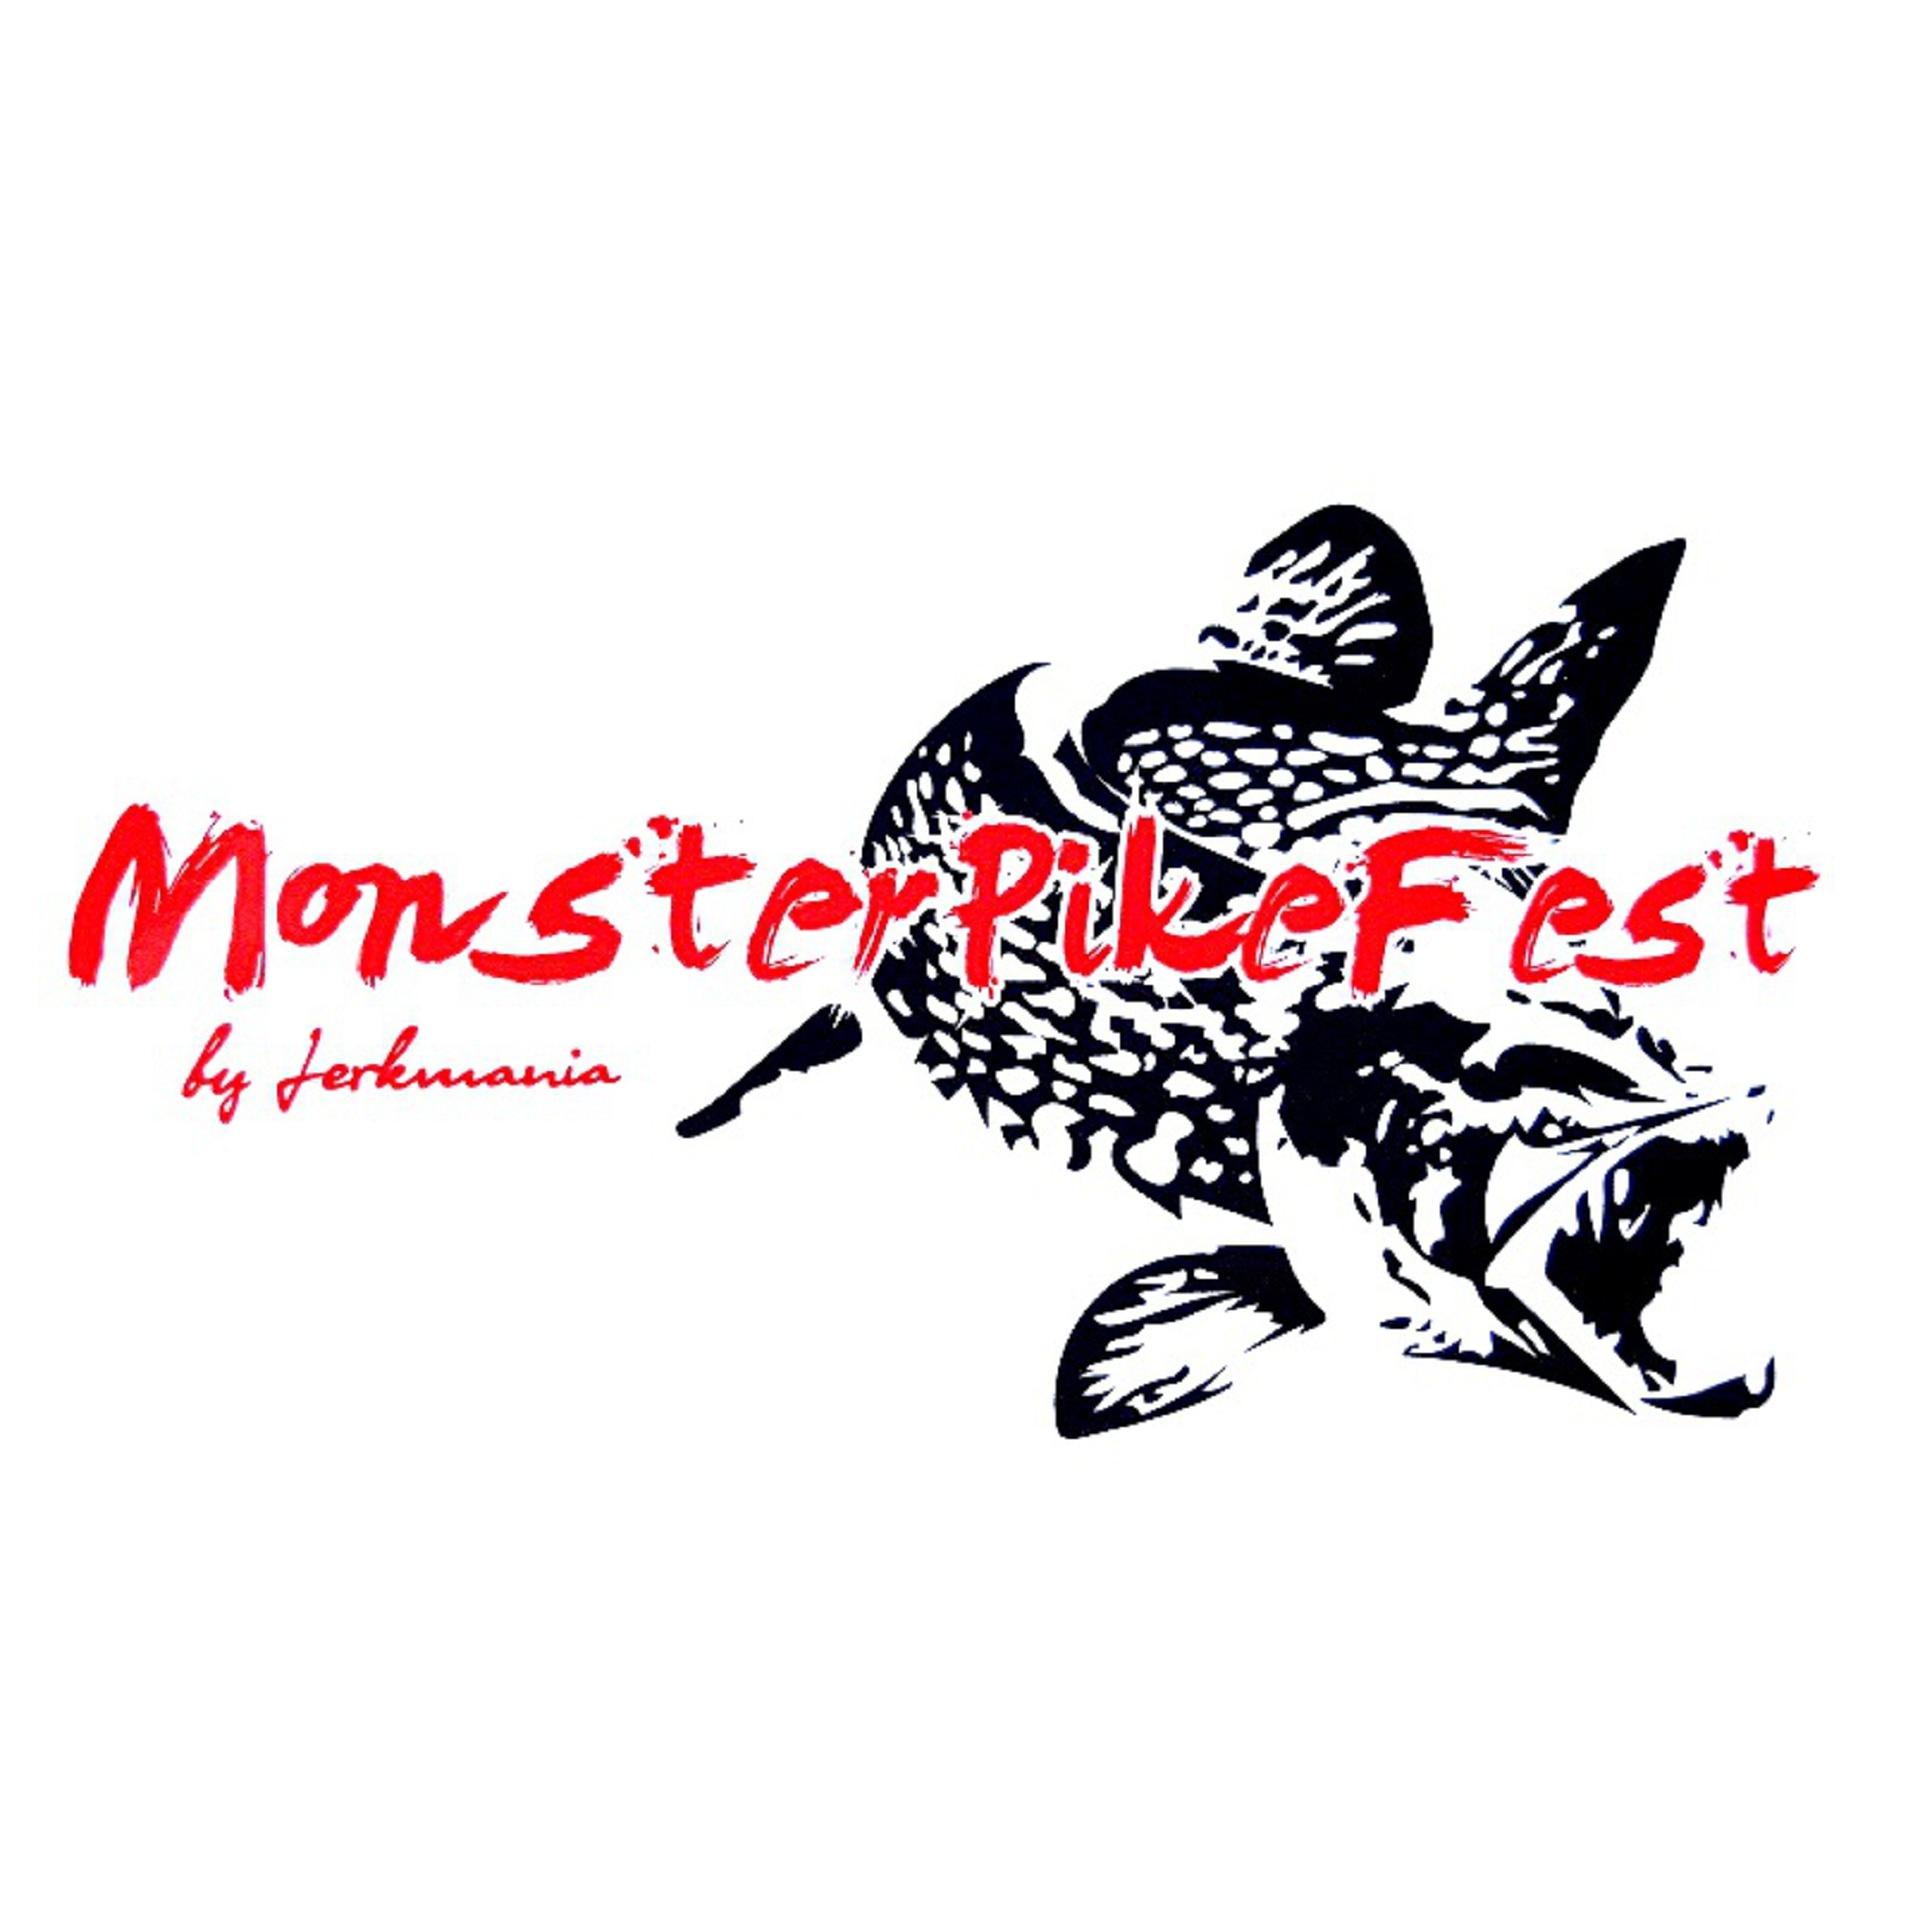 Стикер Monster Pike Fest 2016